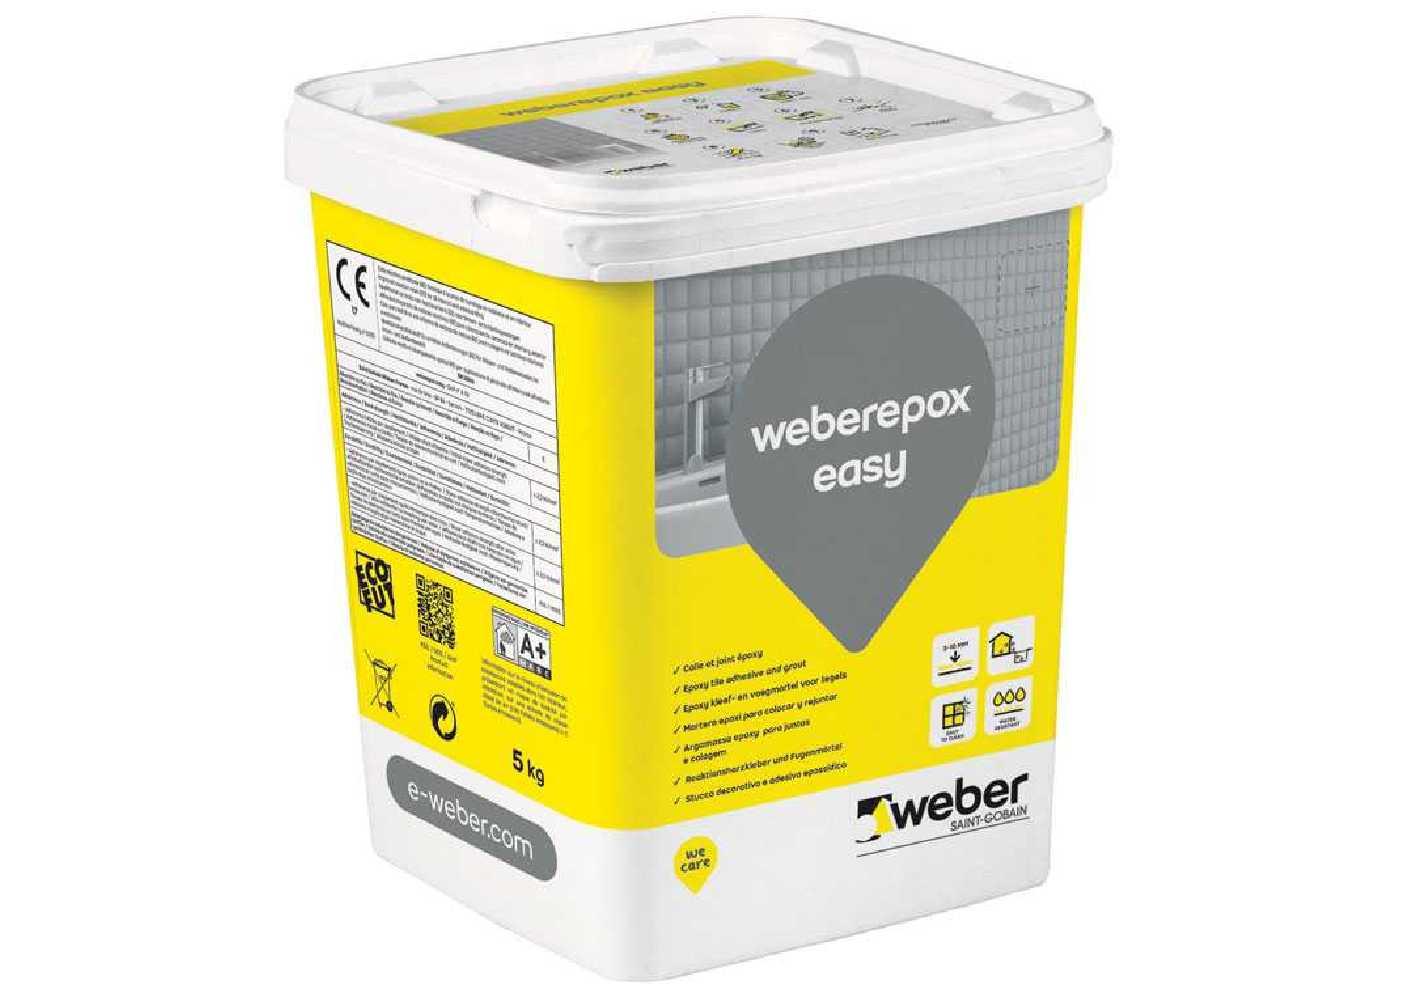 Weberepox easy blanc pot de 5kg